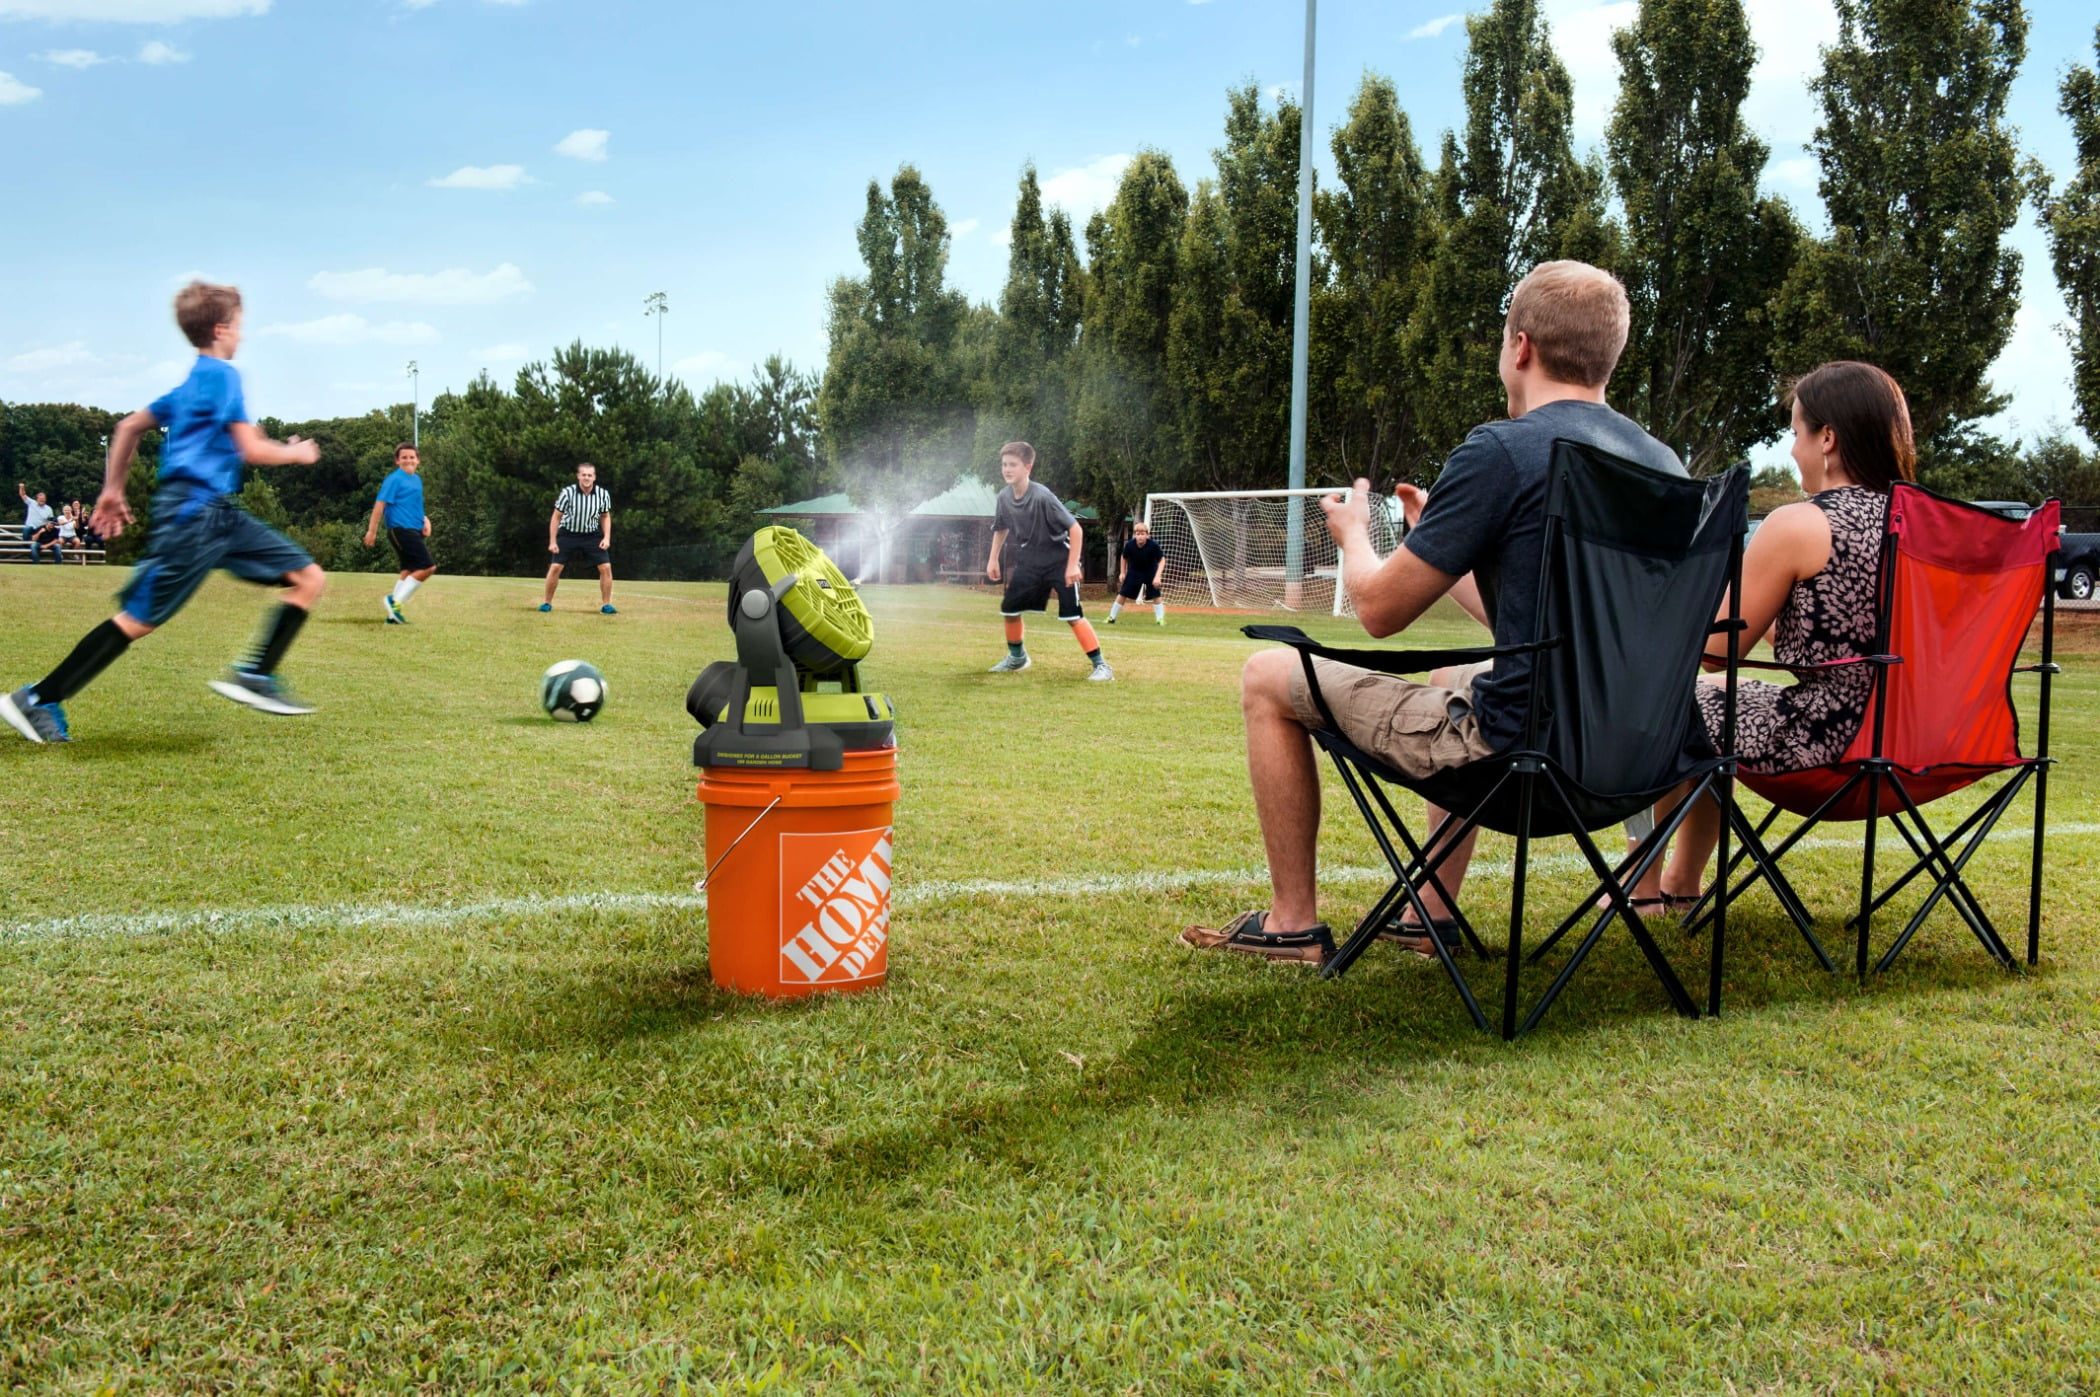 Sports equipment, Sky, Plant, Vertebrate, Cloud, Tree, Football, Water, Grass, Chair